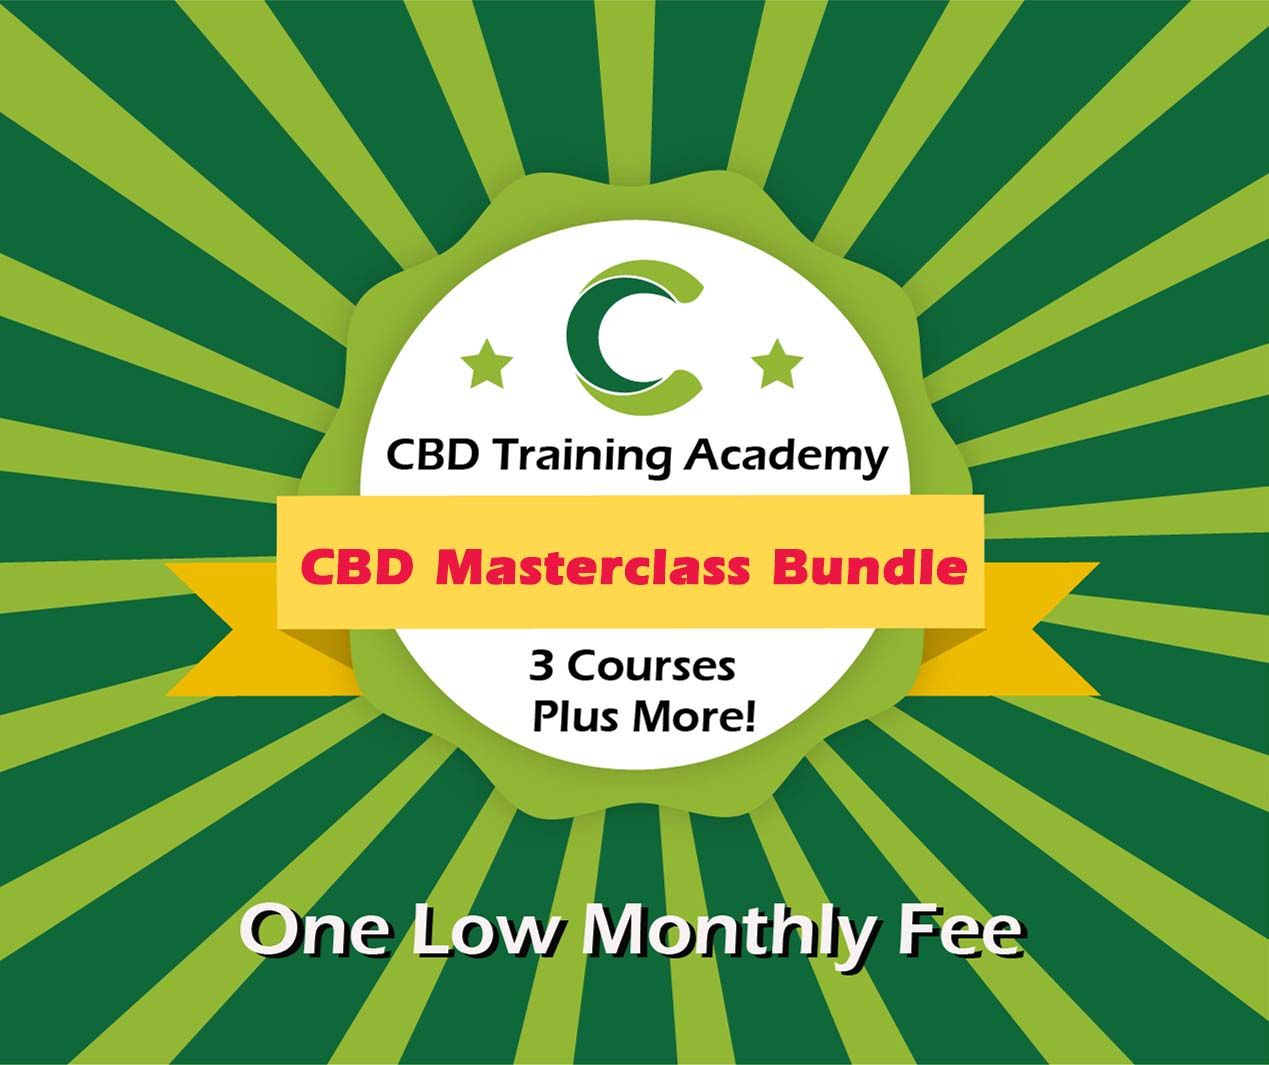 CBD Master Class Bundle